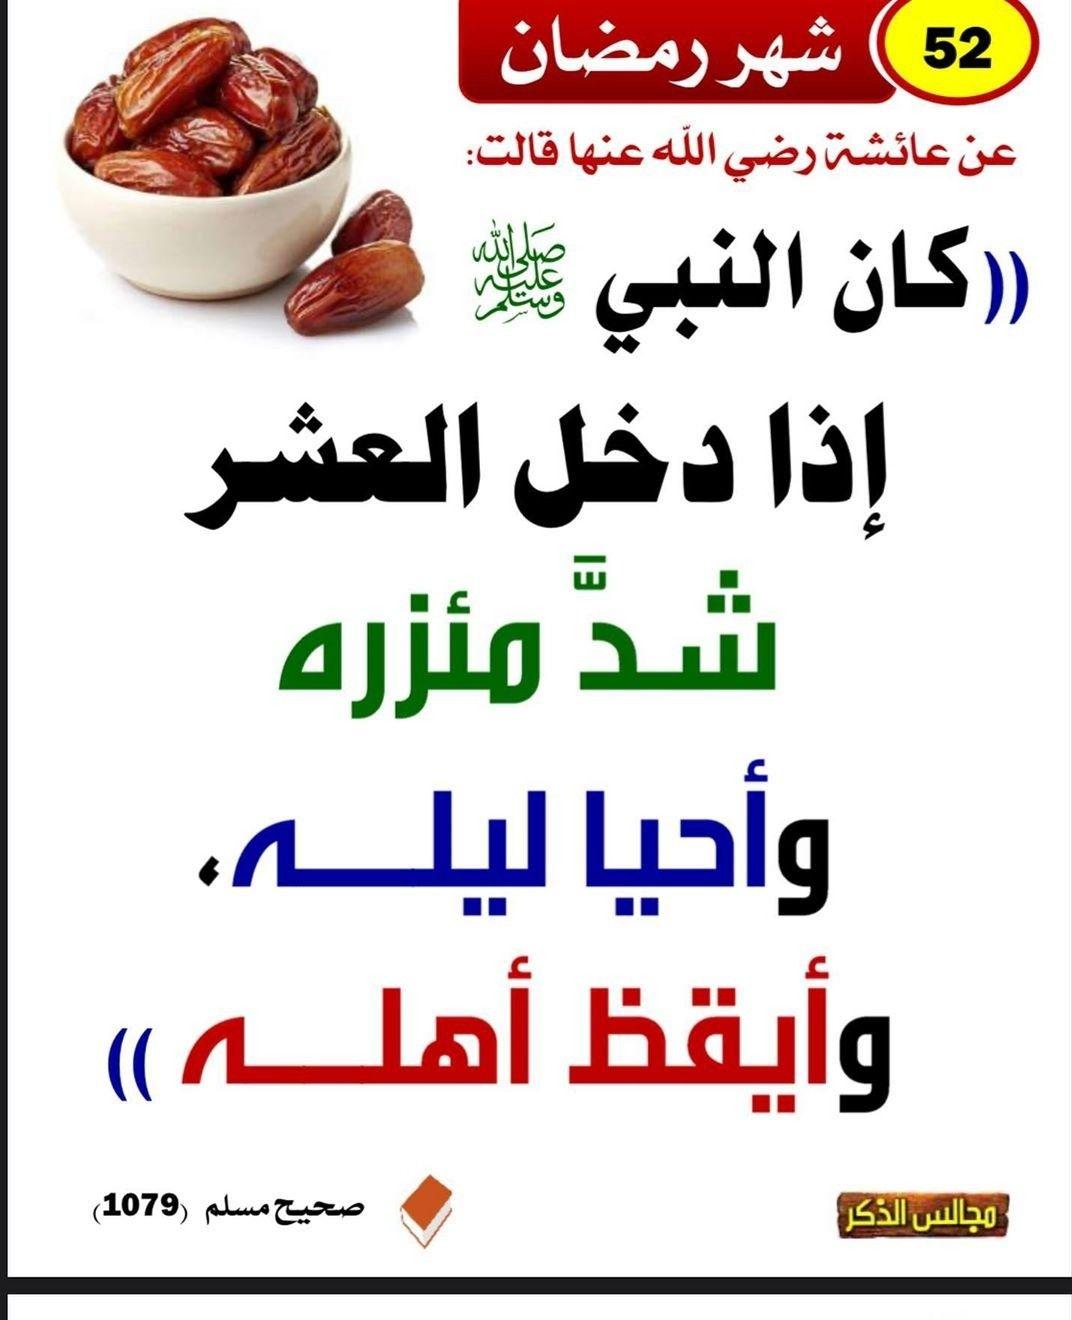 Pin By Mousli Mah On أحاديث نبوية ١ Ahadith Hadith Islamic Quotes Quran